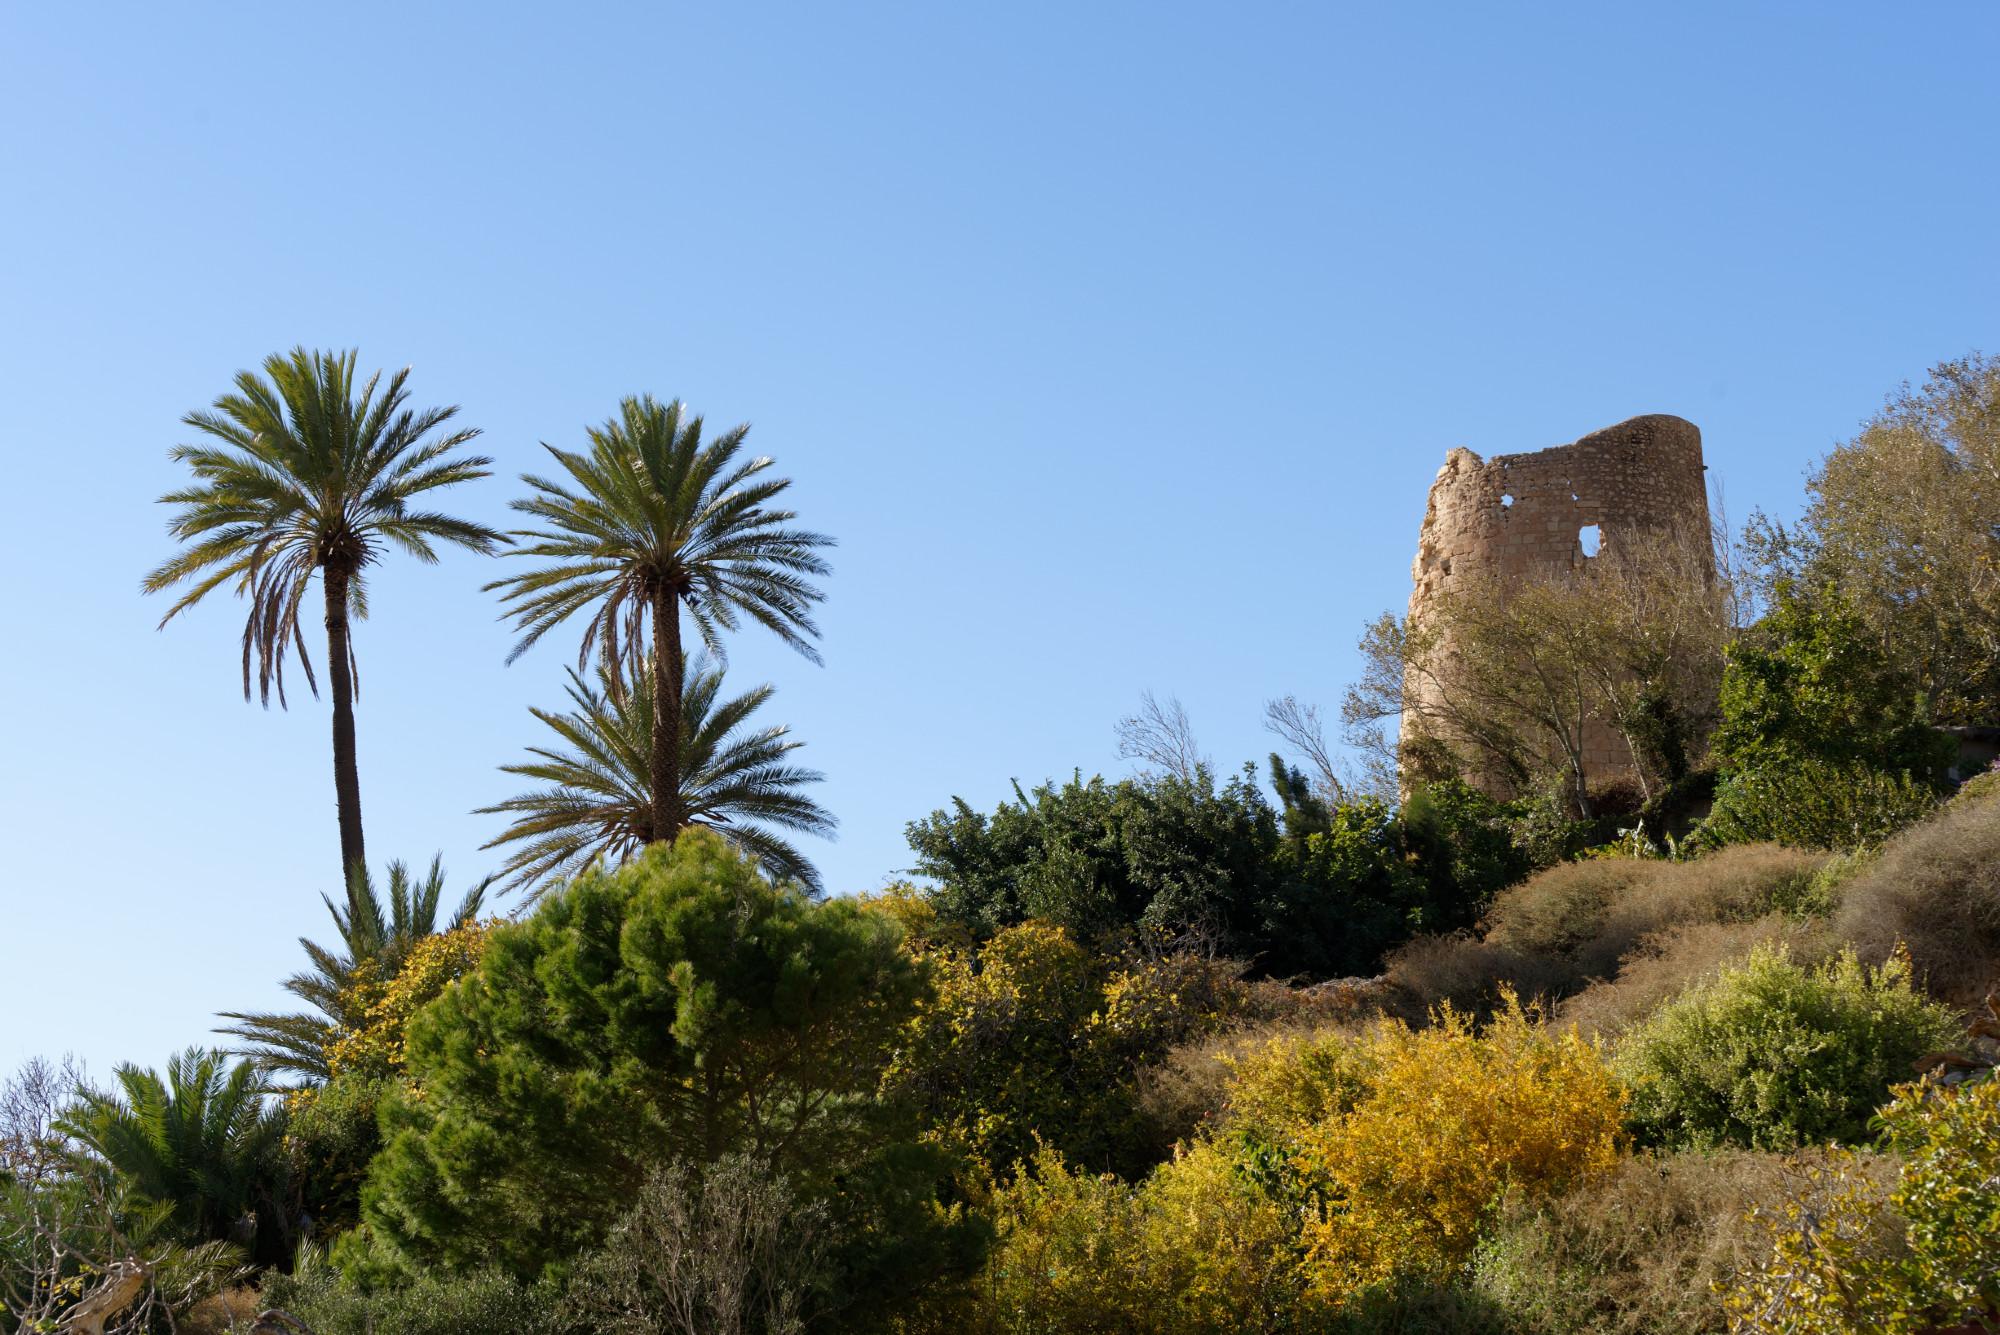 171213-Marche Las Negras-Cala San Pedro-Las Negras (59) (Cabo de Gata-Andalousie)